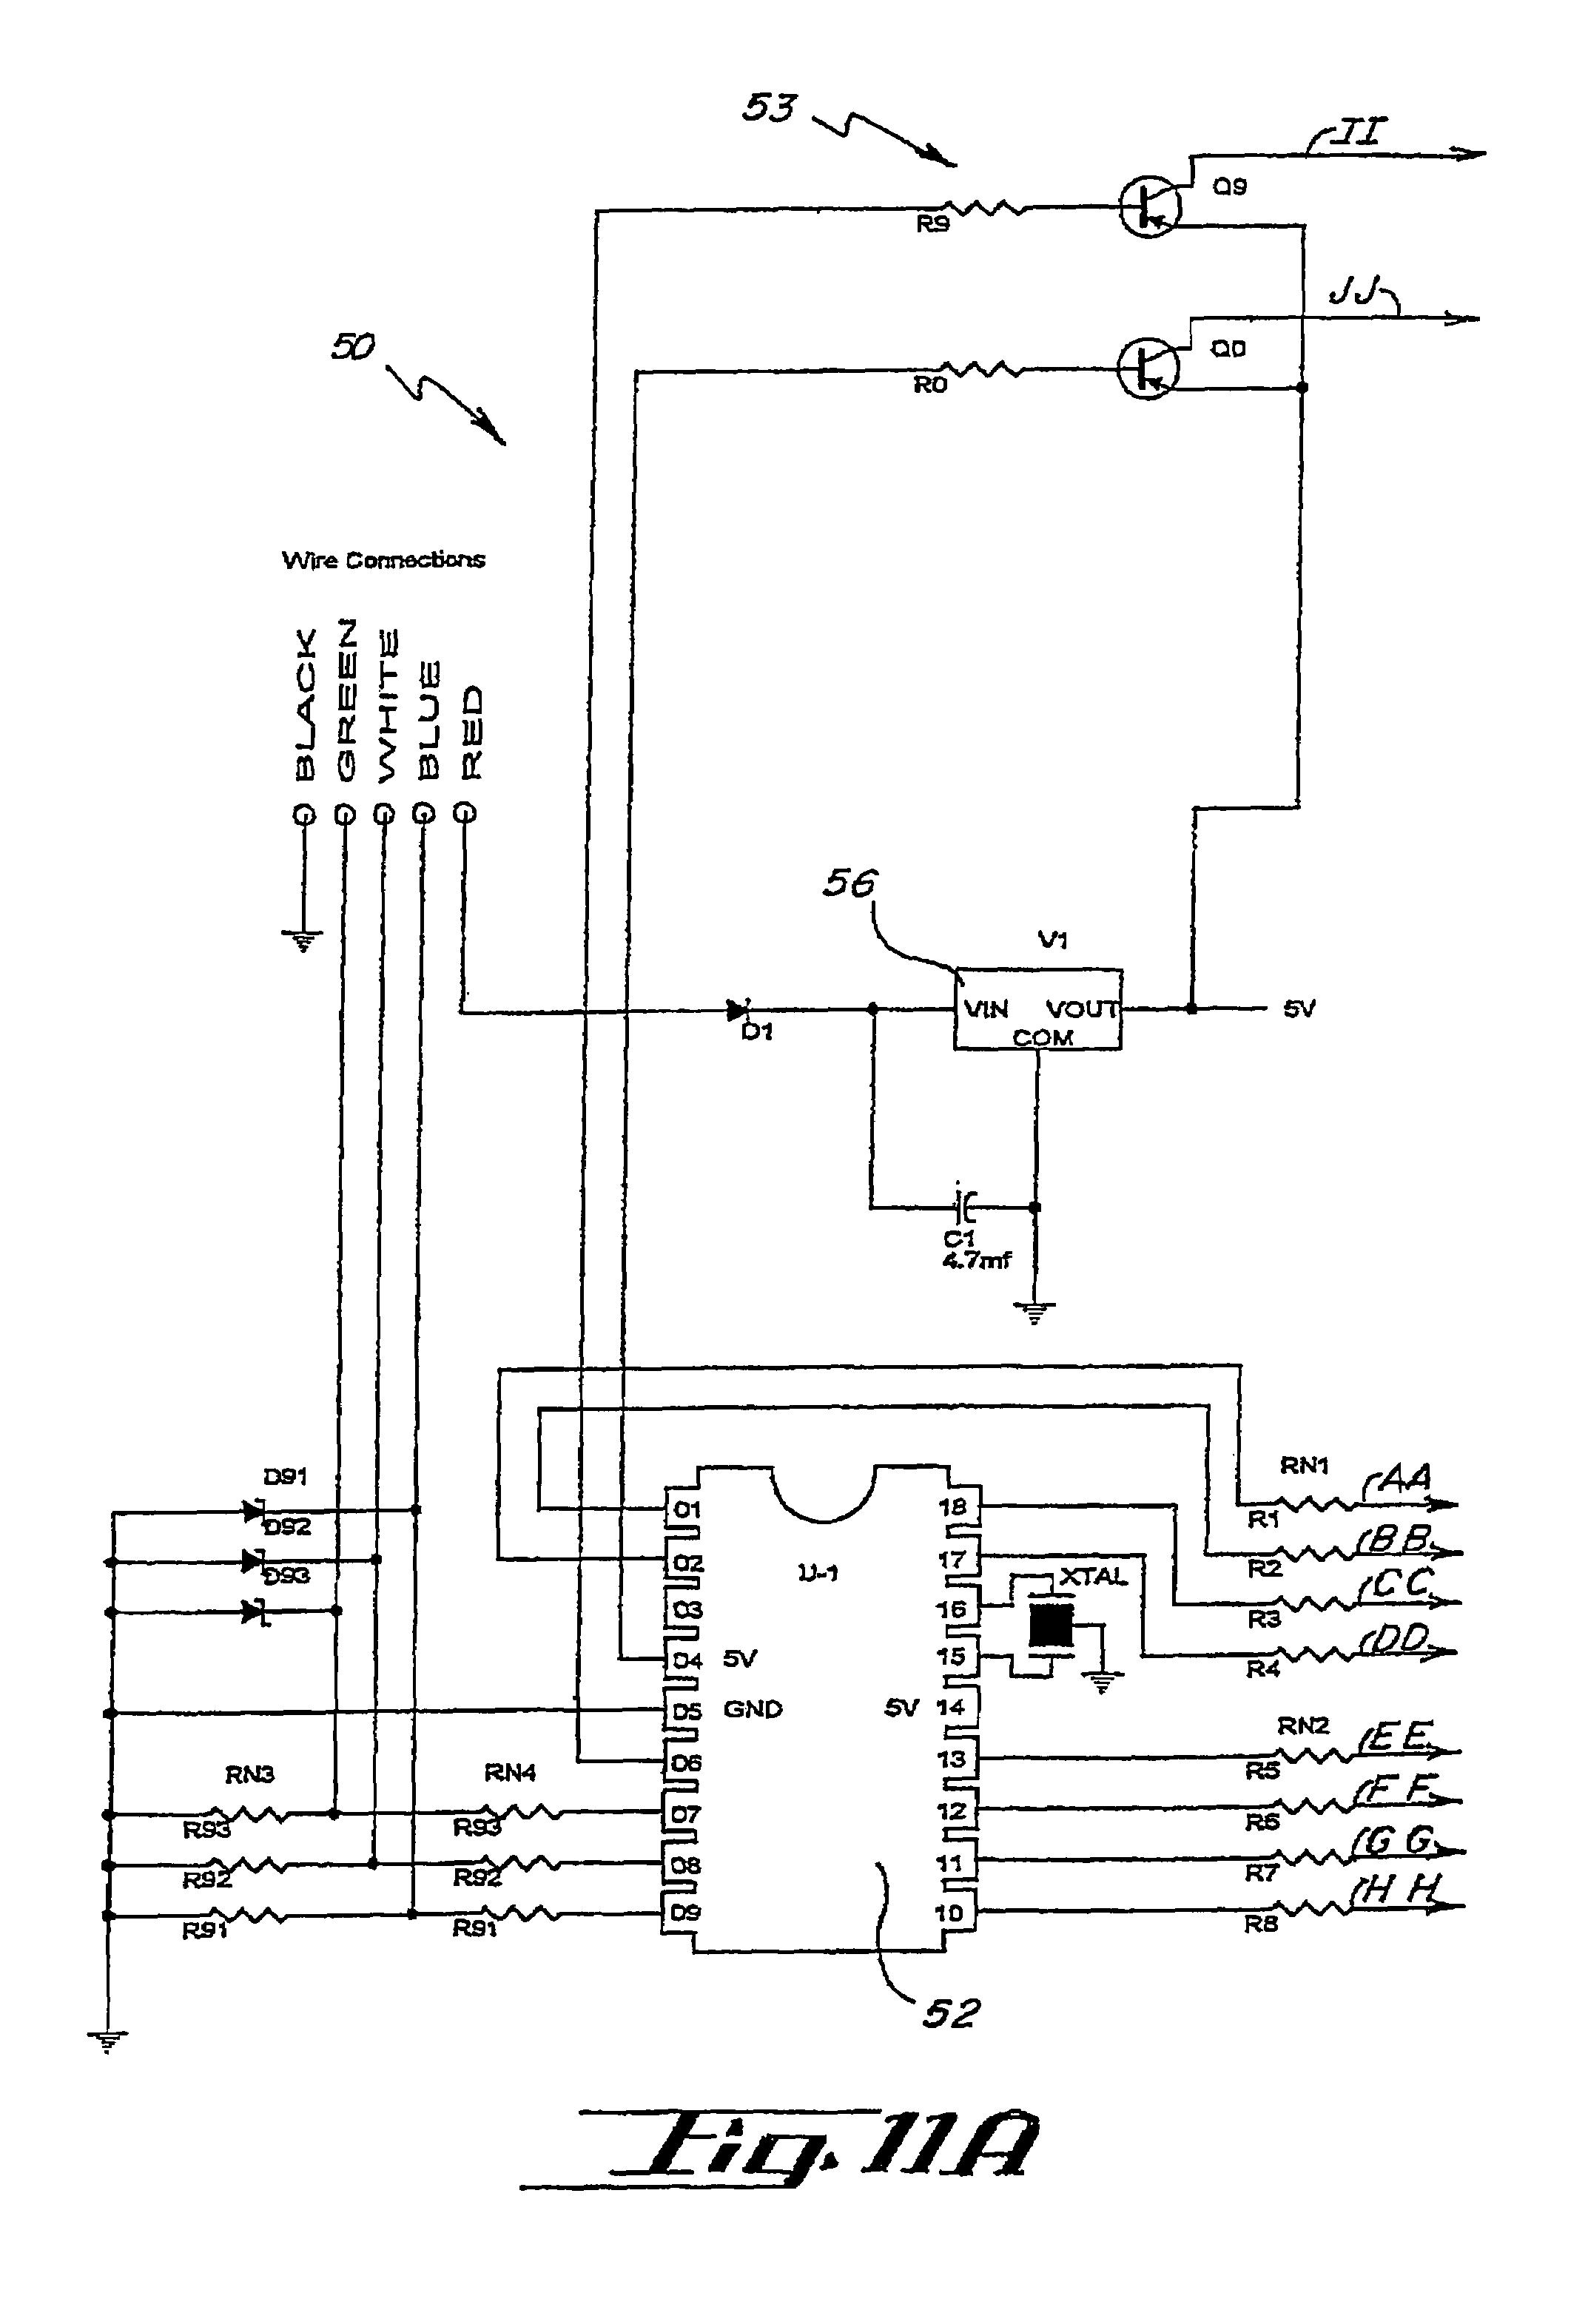 US07561036 20090714 D00005?resize\=665%2C973 whelen headlight flasher wiring diagram whelen wiring diagrams whelen 295hfsa1 wiring diagram at eliteediting.co